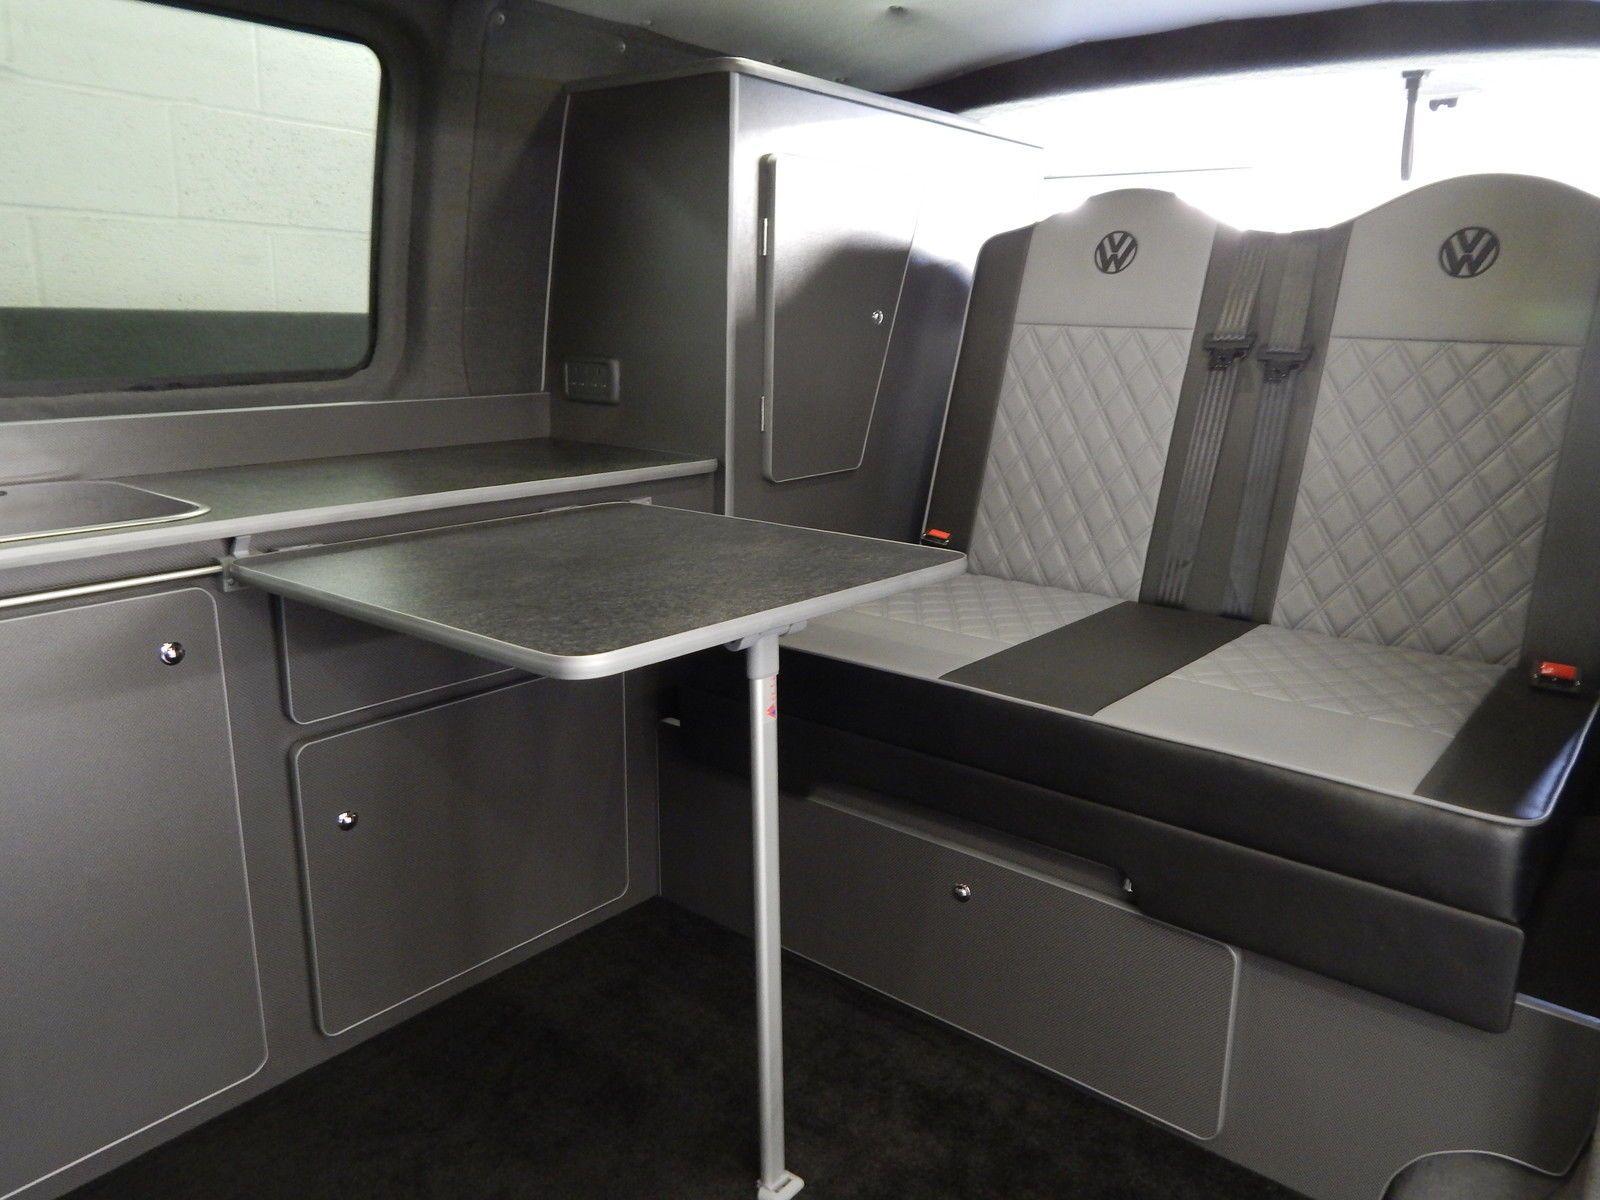 vw transporter 3 4 rock and roll bed seat self raising. Black Bedroom Furniture Sets. Home Design Ideas